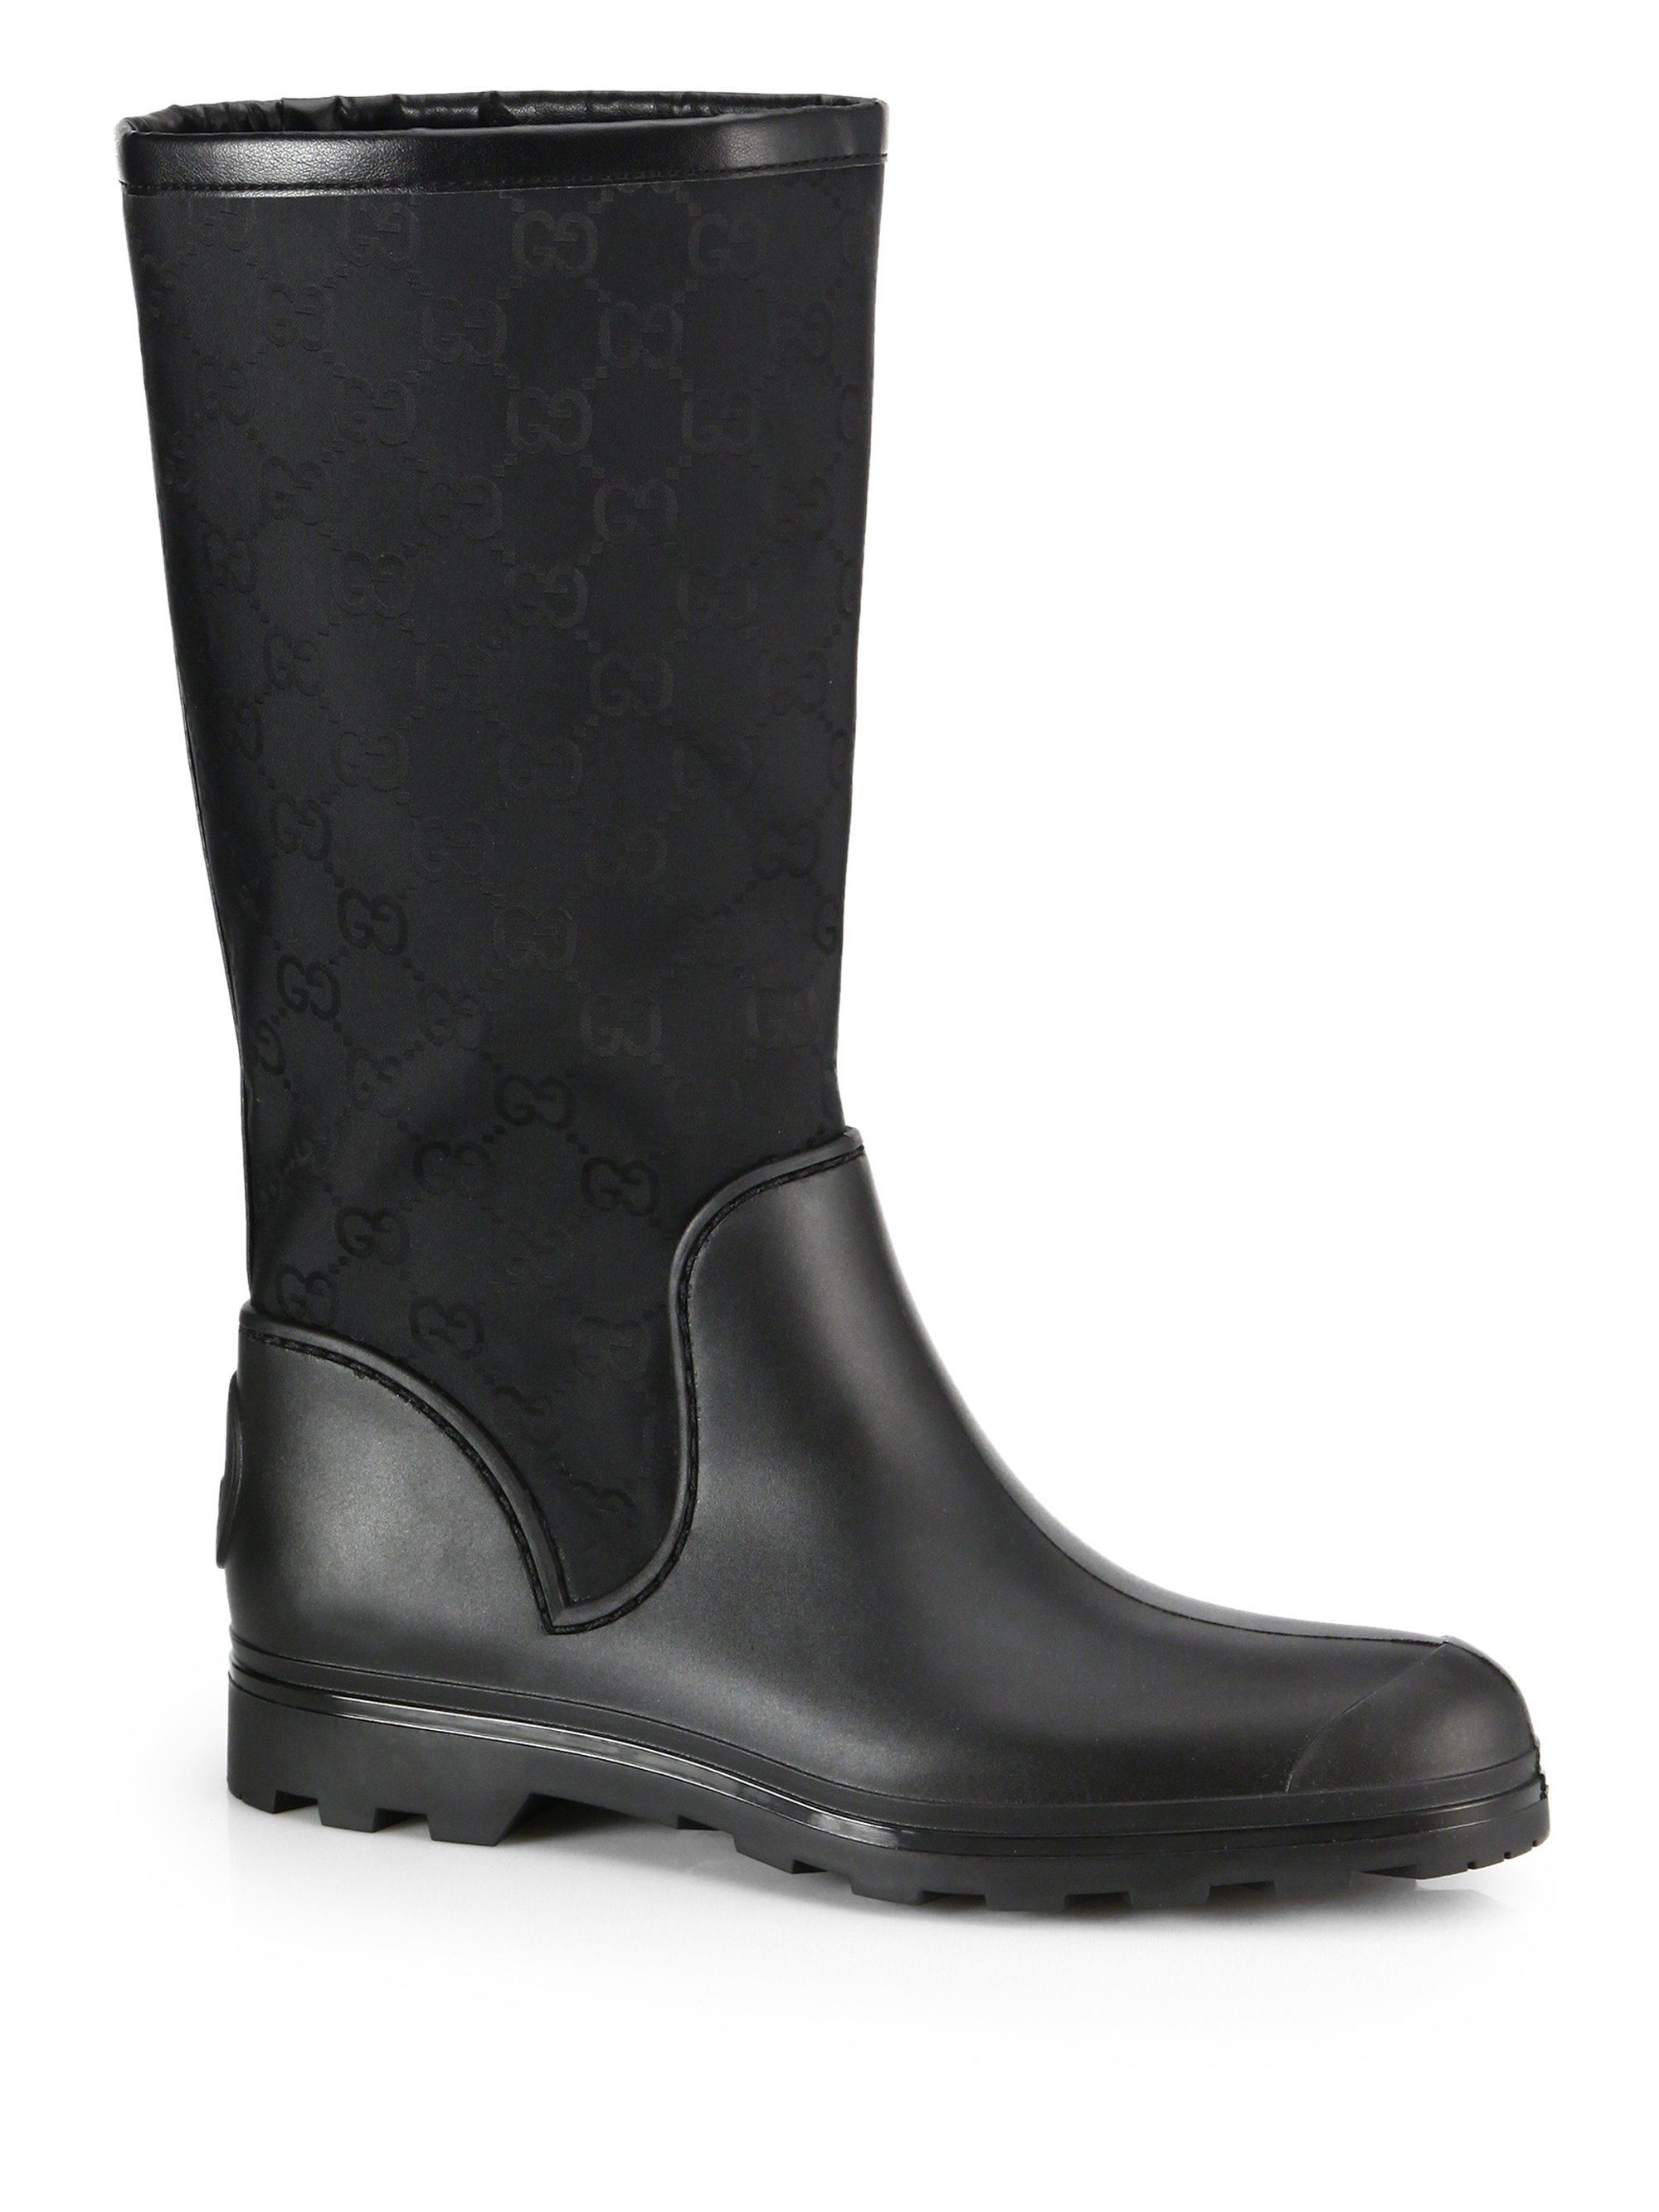 Fantastic Gucci Rain Boots  Shoes  GUC22571  The RealReal